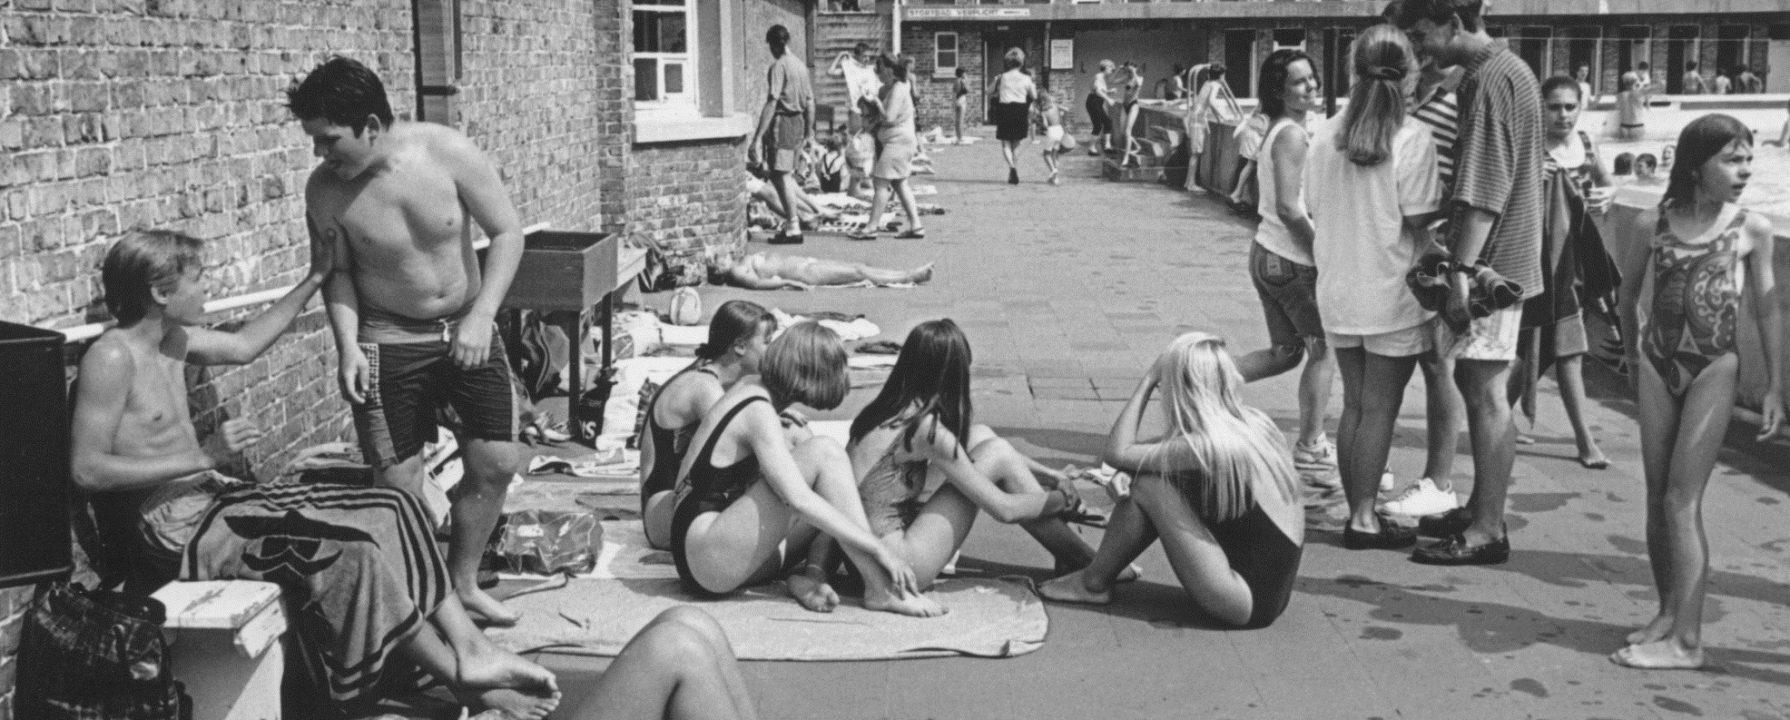 open zwembad 1990